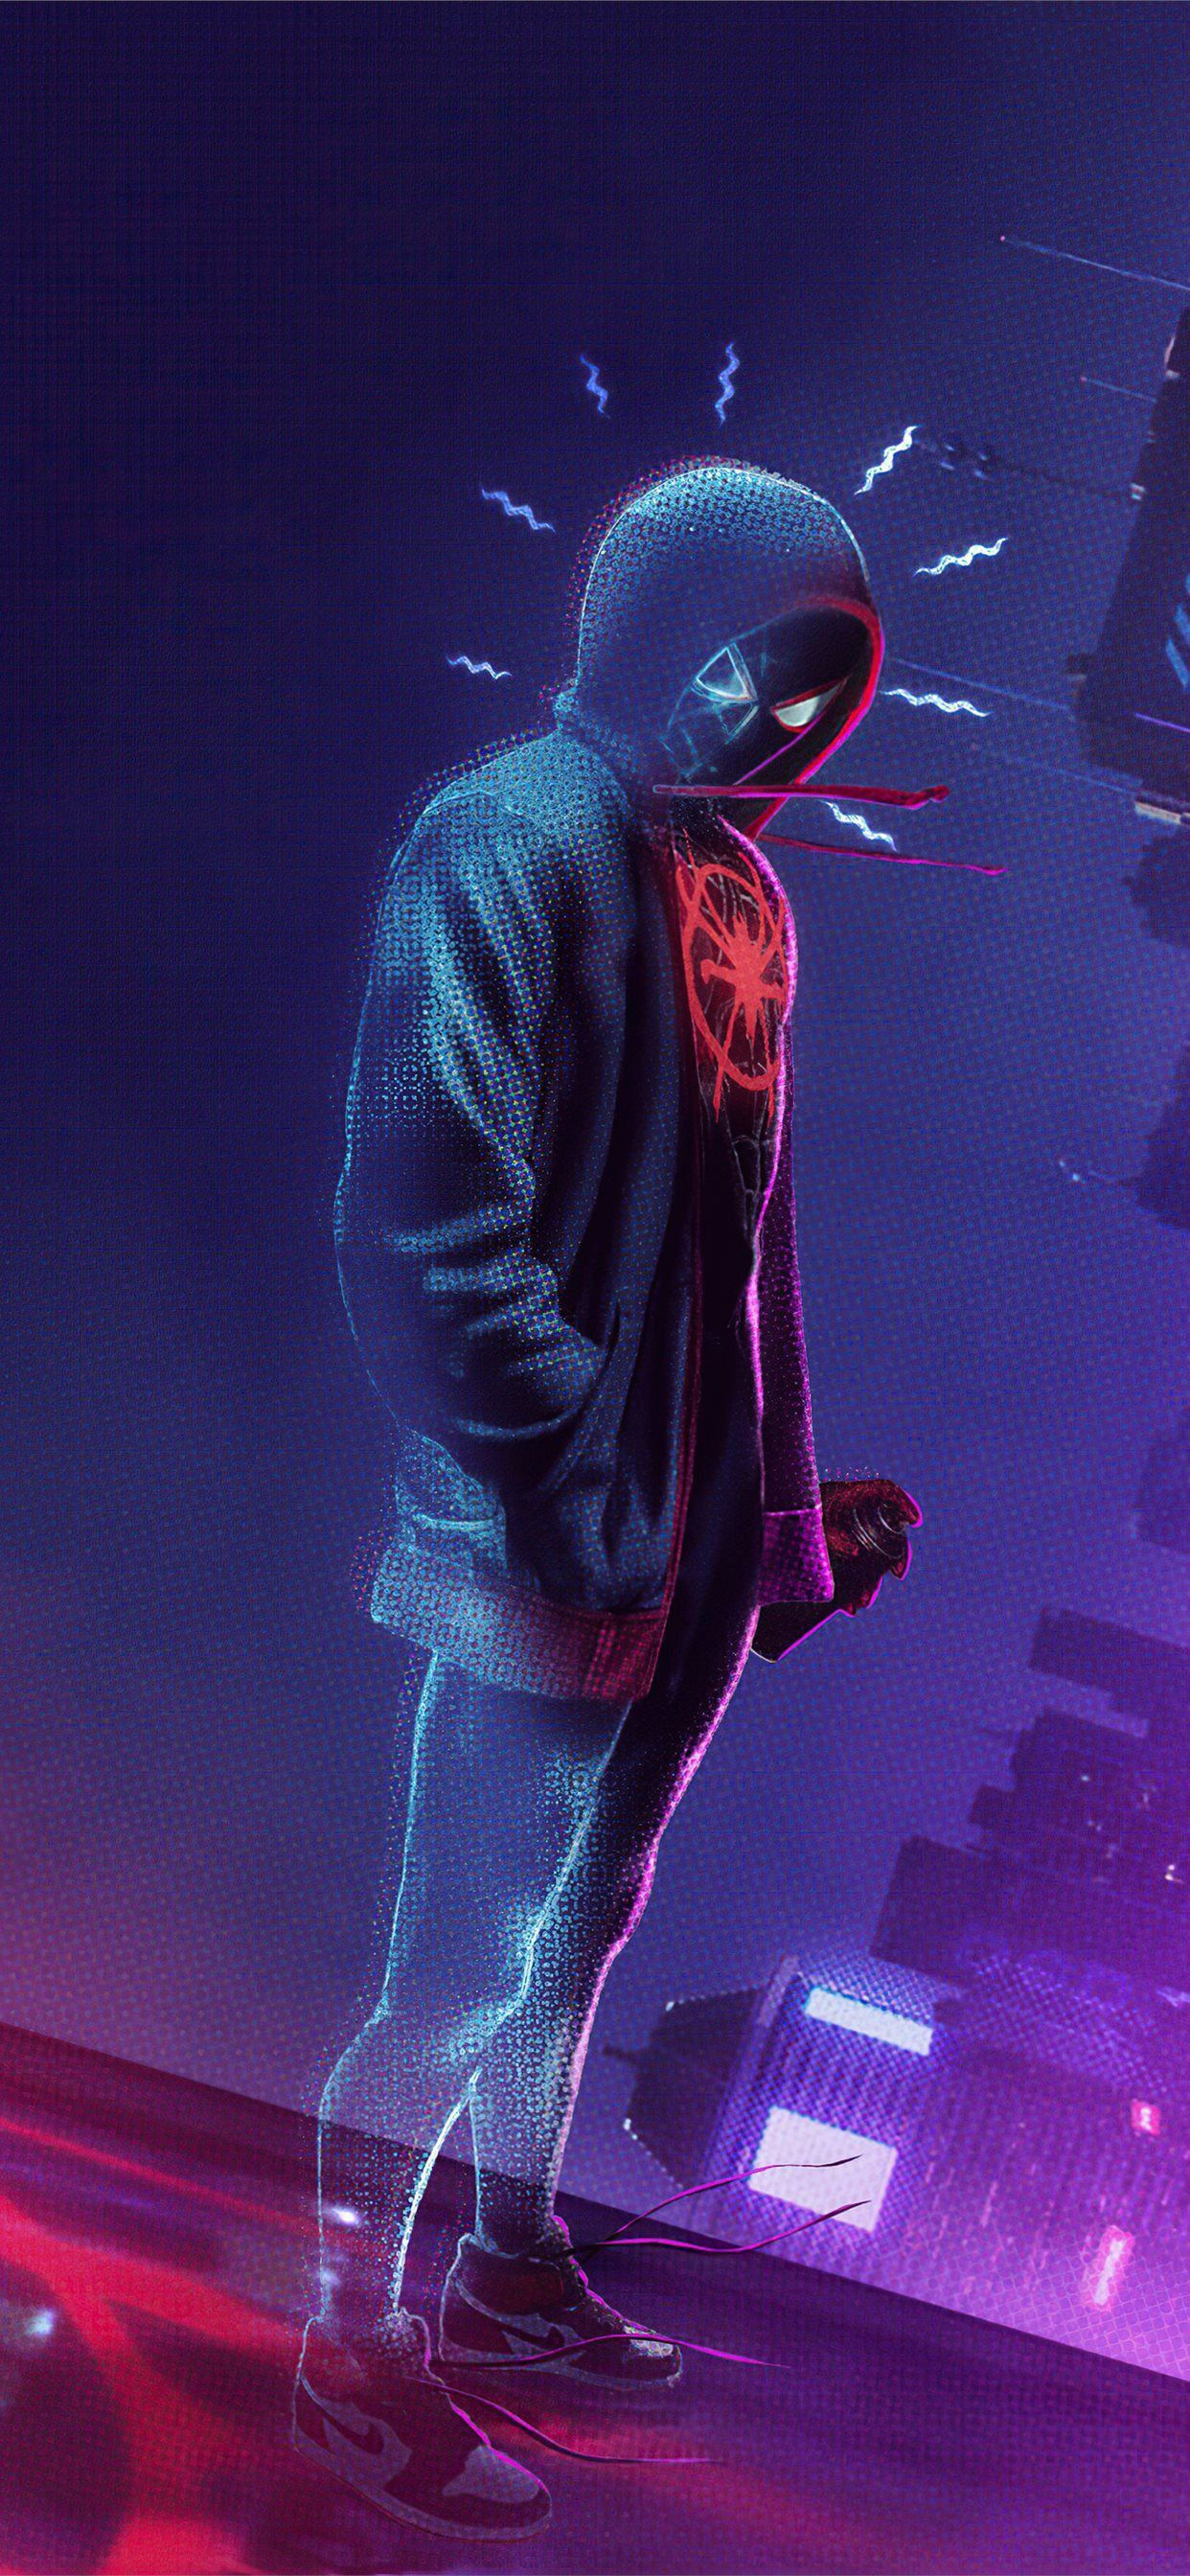 Iphone Wallpaper in 2020 Spiderman, Pikachu wallpaper